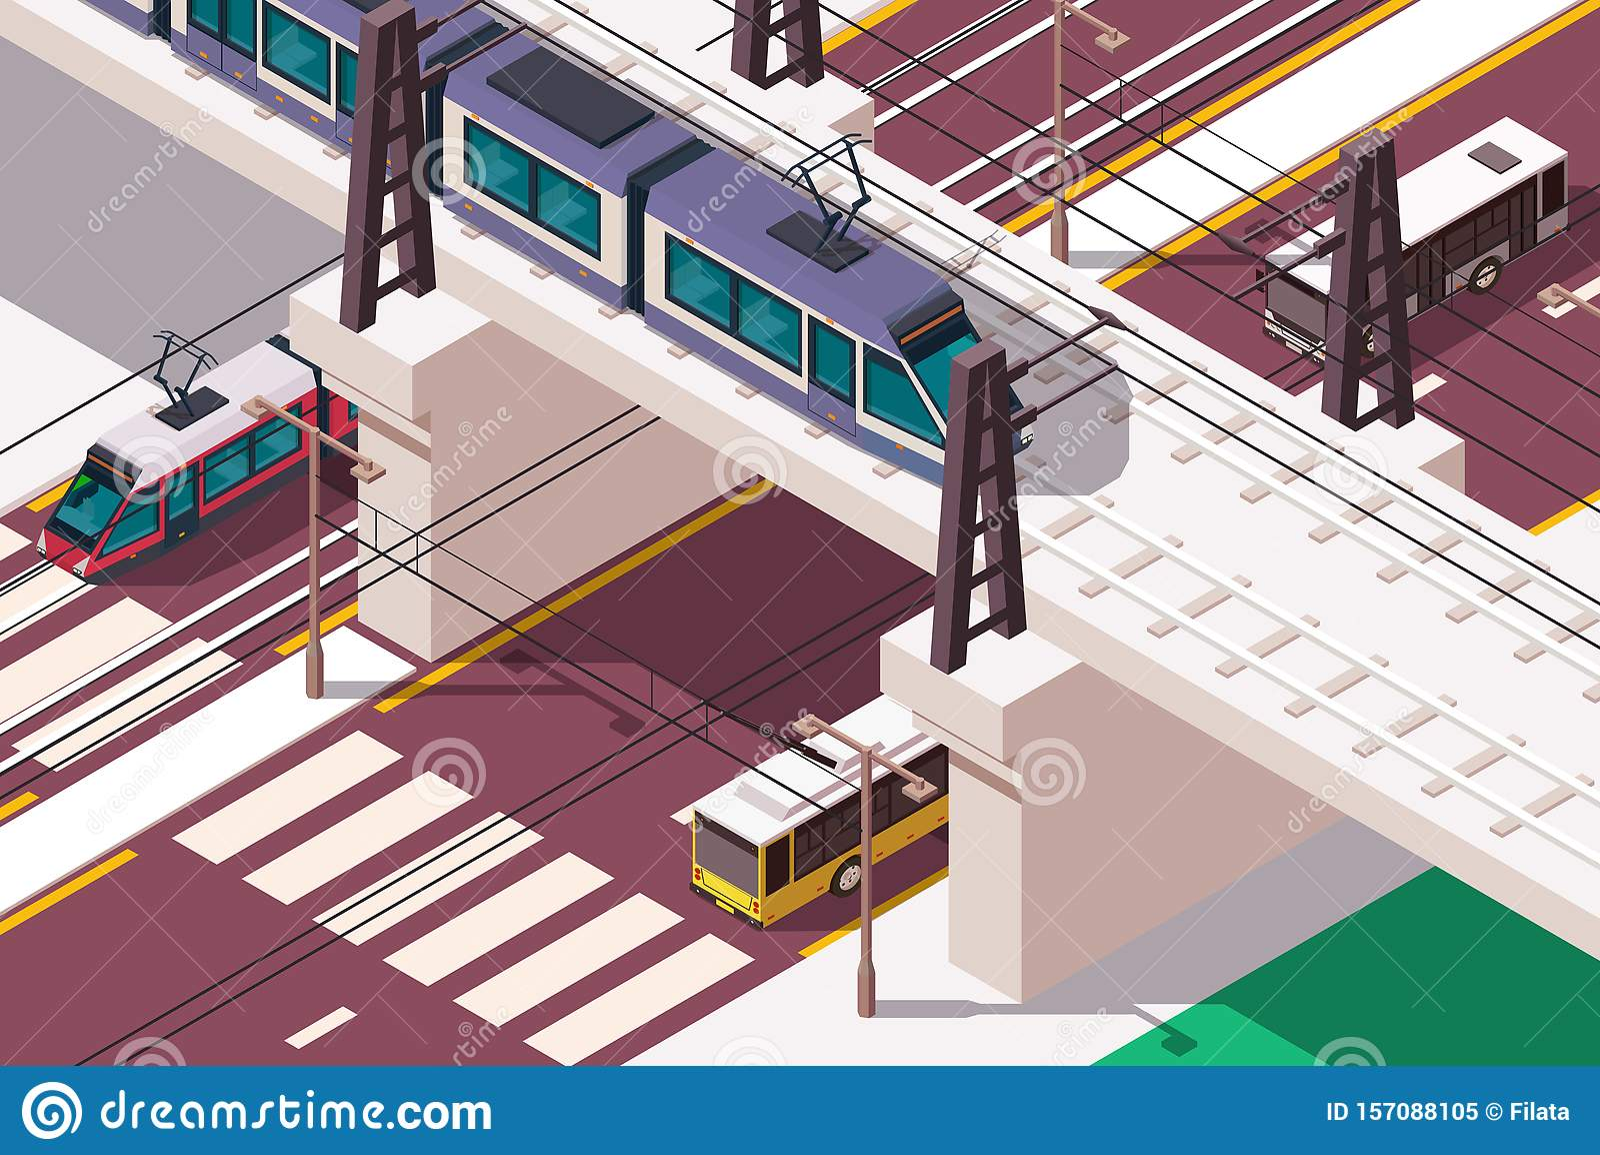 3d isometric urban railway bridge over road in city.